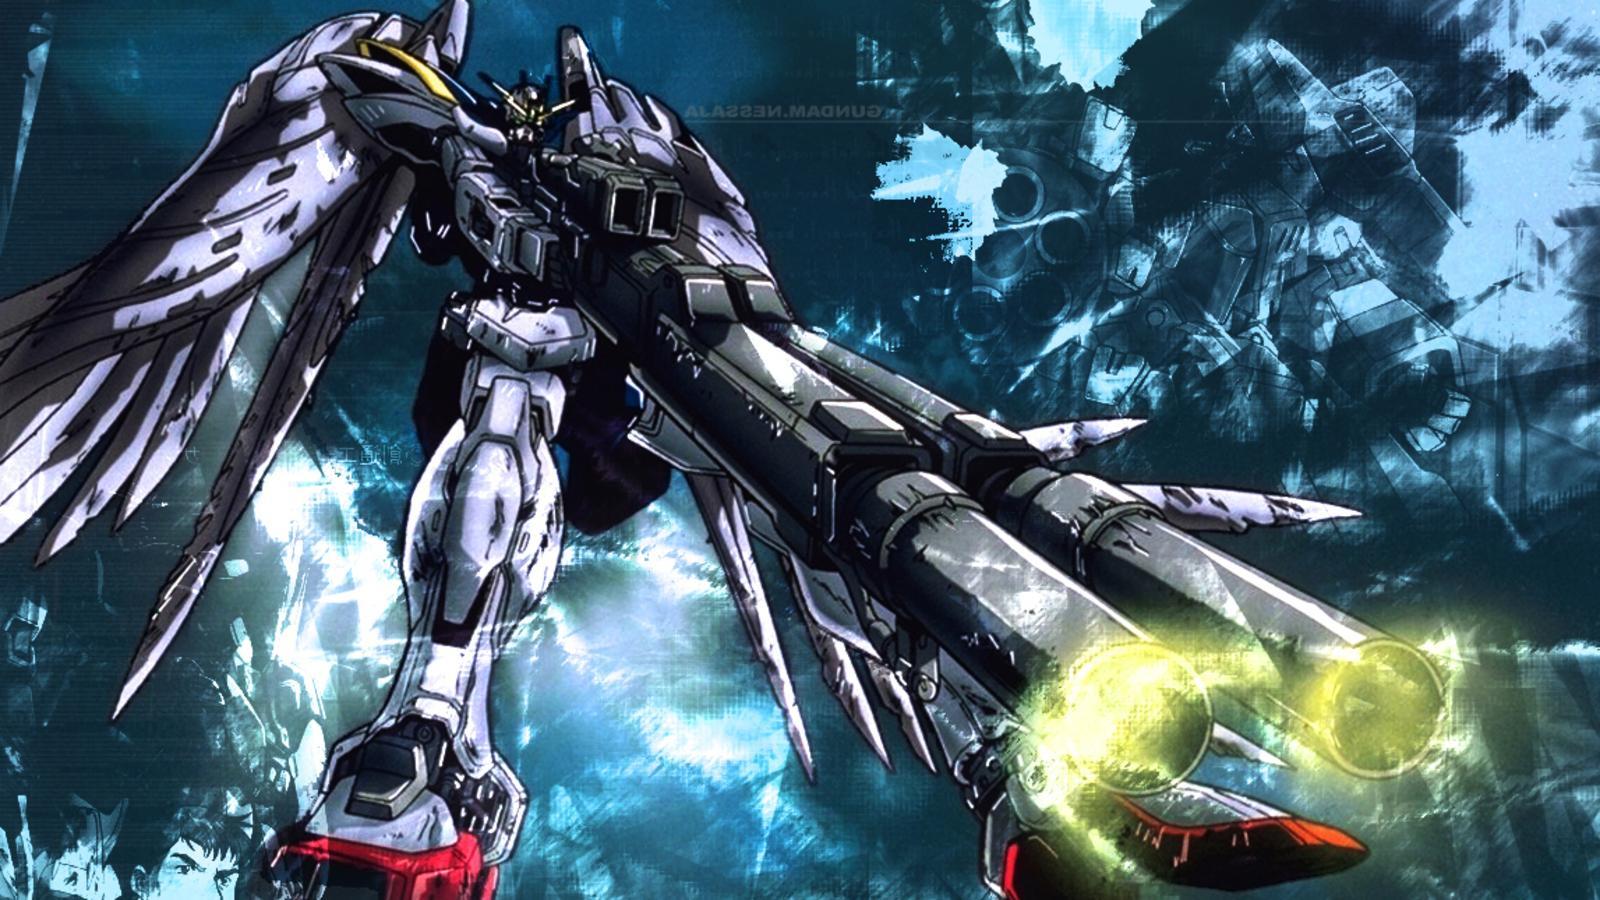 Gundam Wallpapers Top Free Gundam Backgrounds